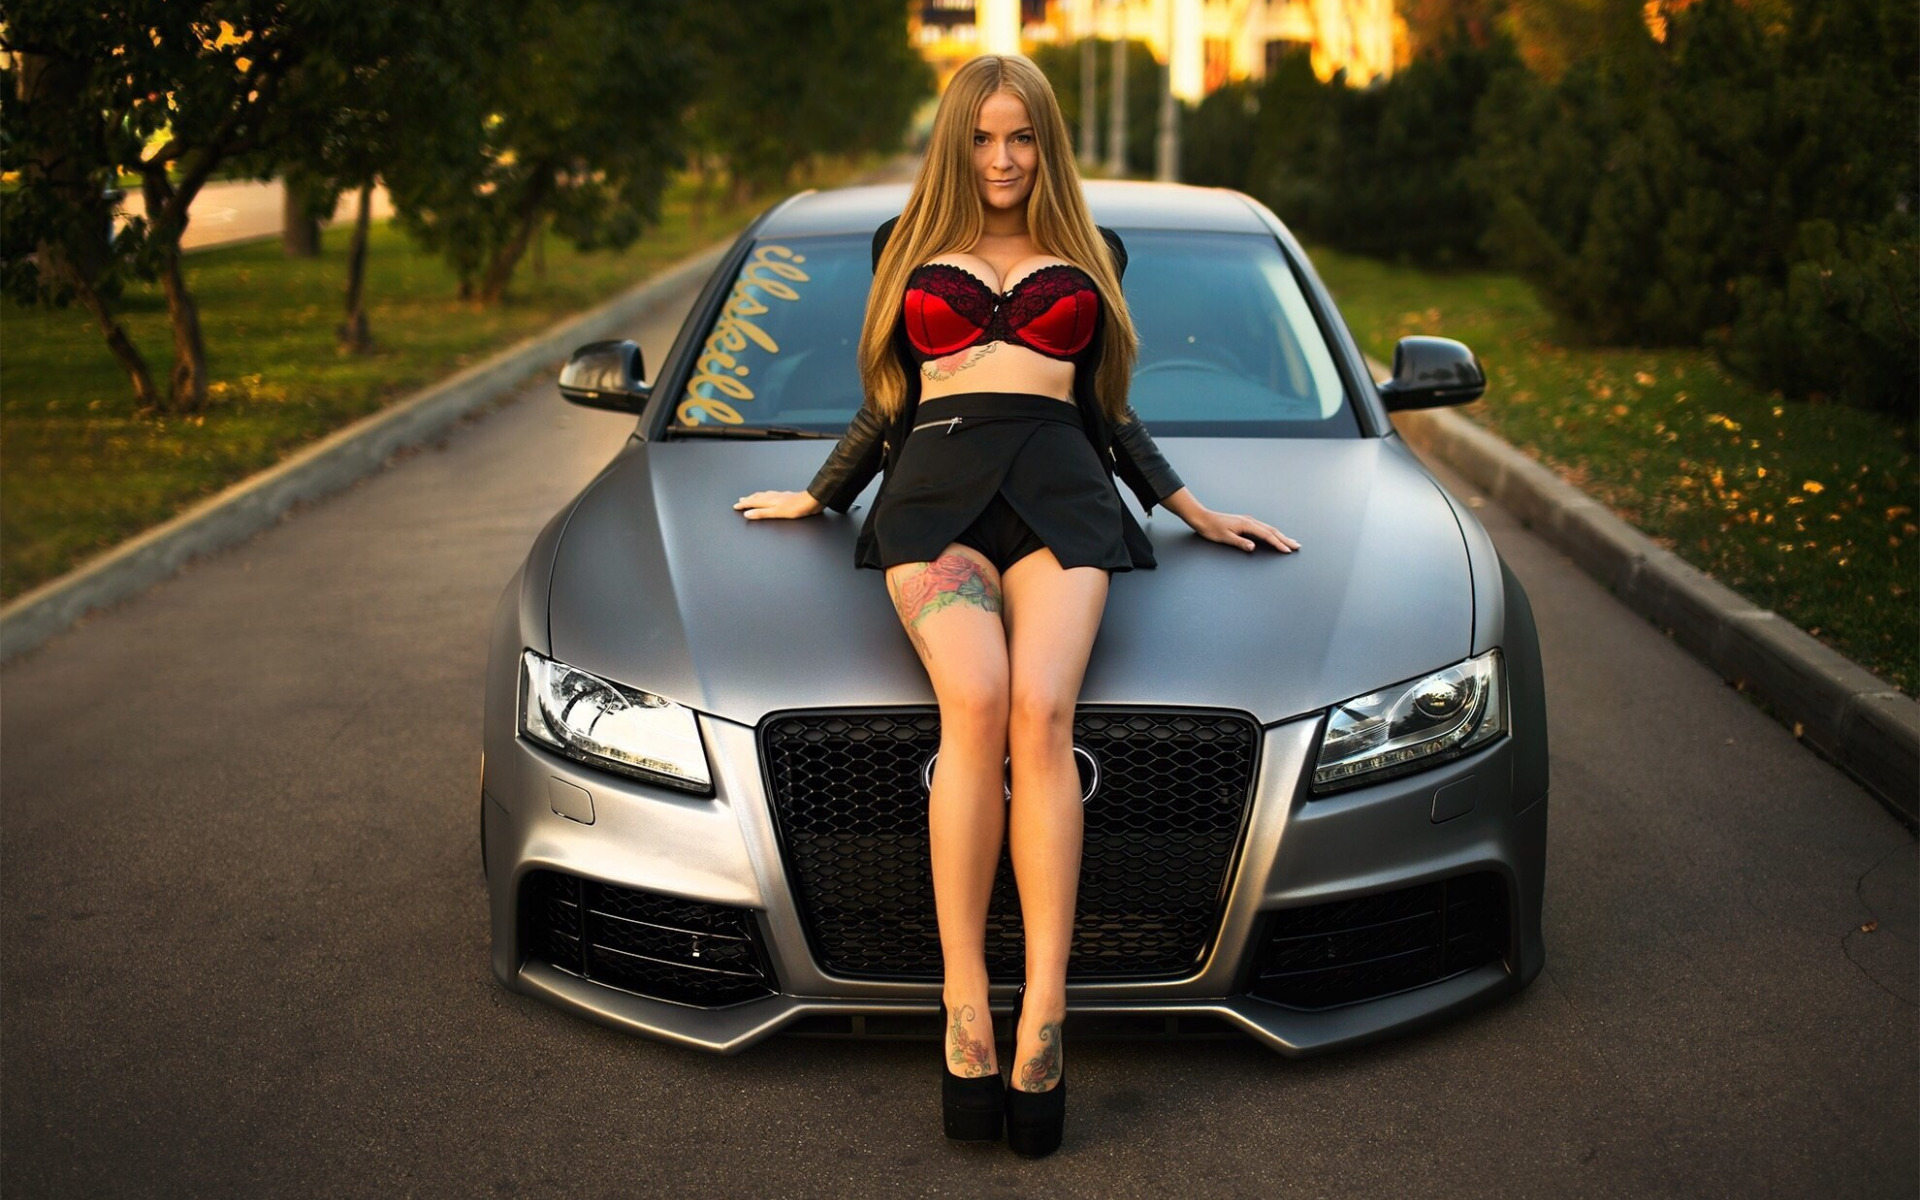 Фото девушек на капоте машины